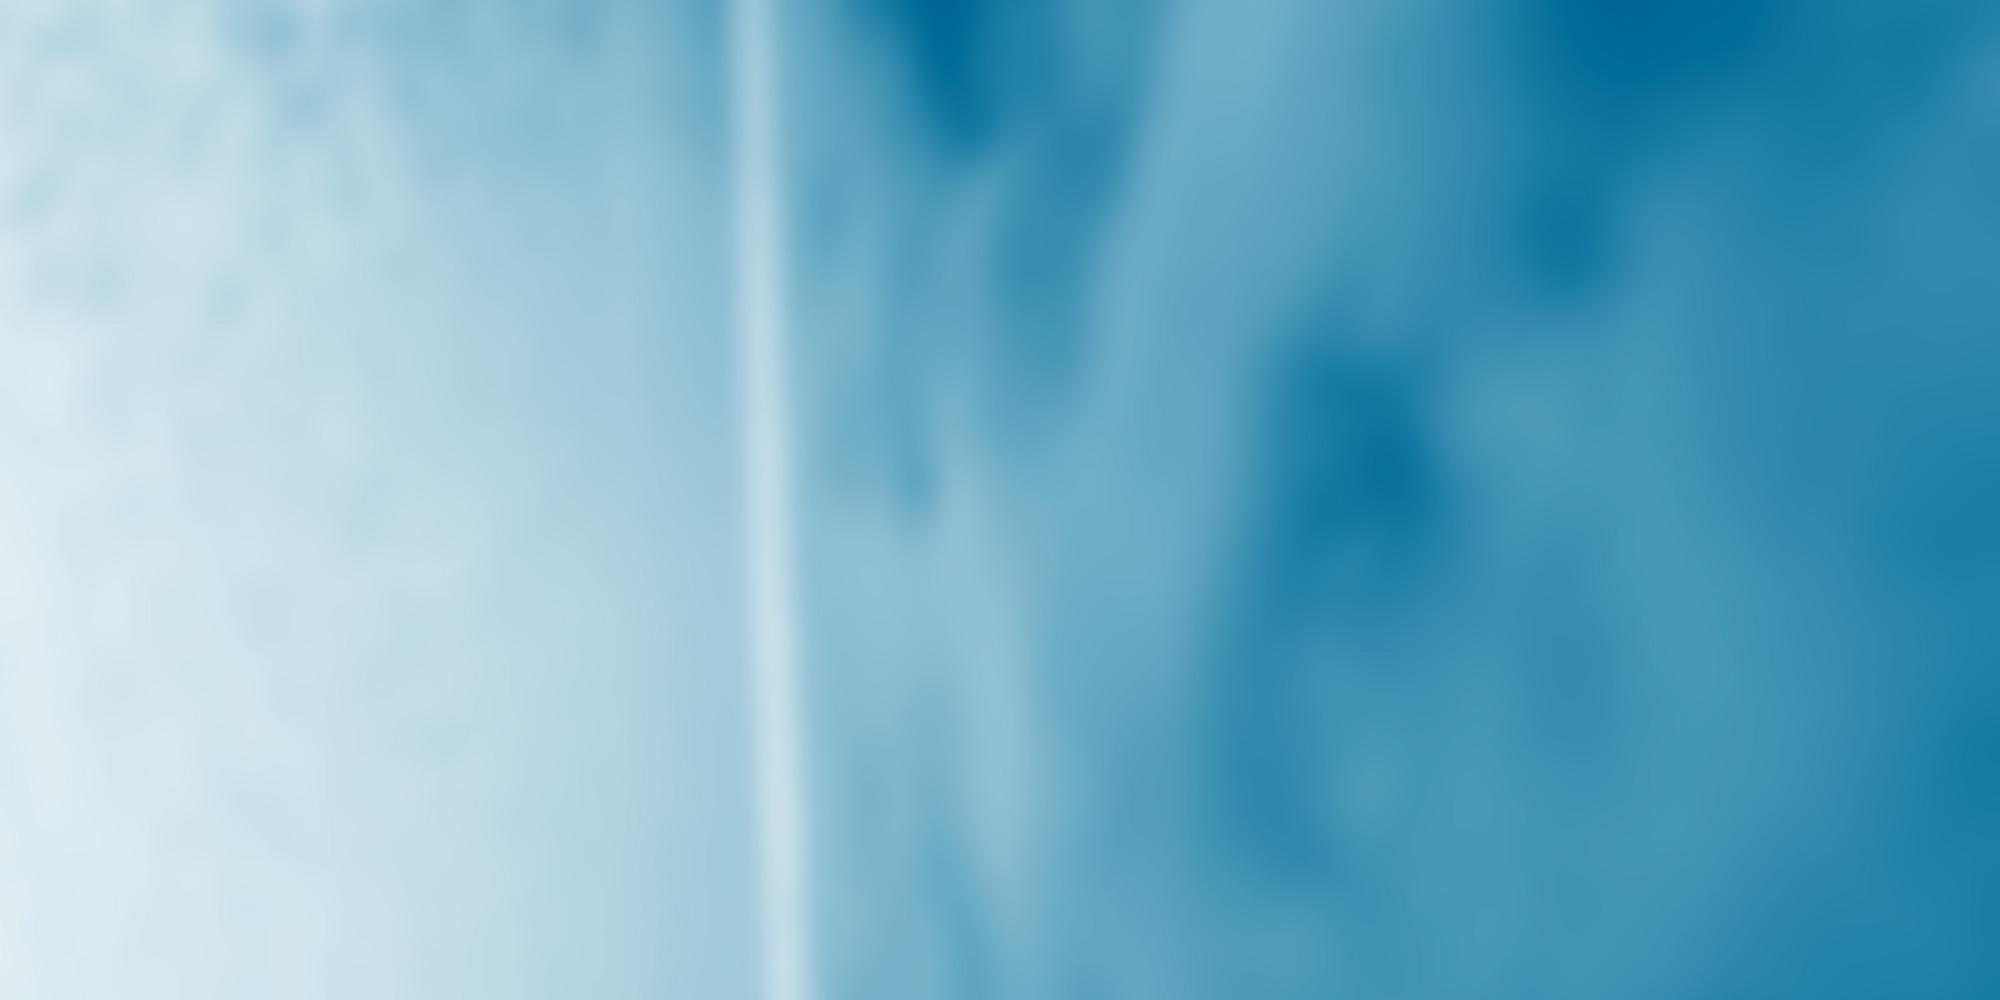 fusograph blue white 2 1.jpg